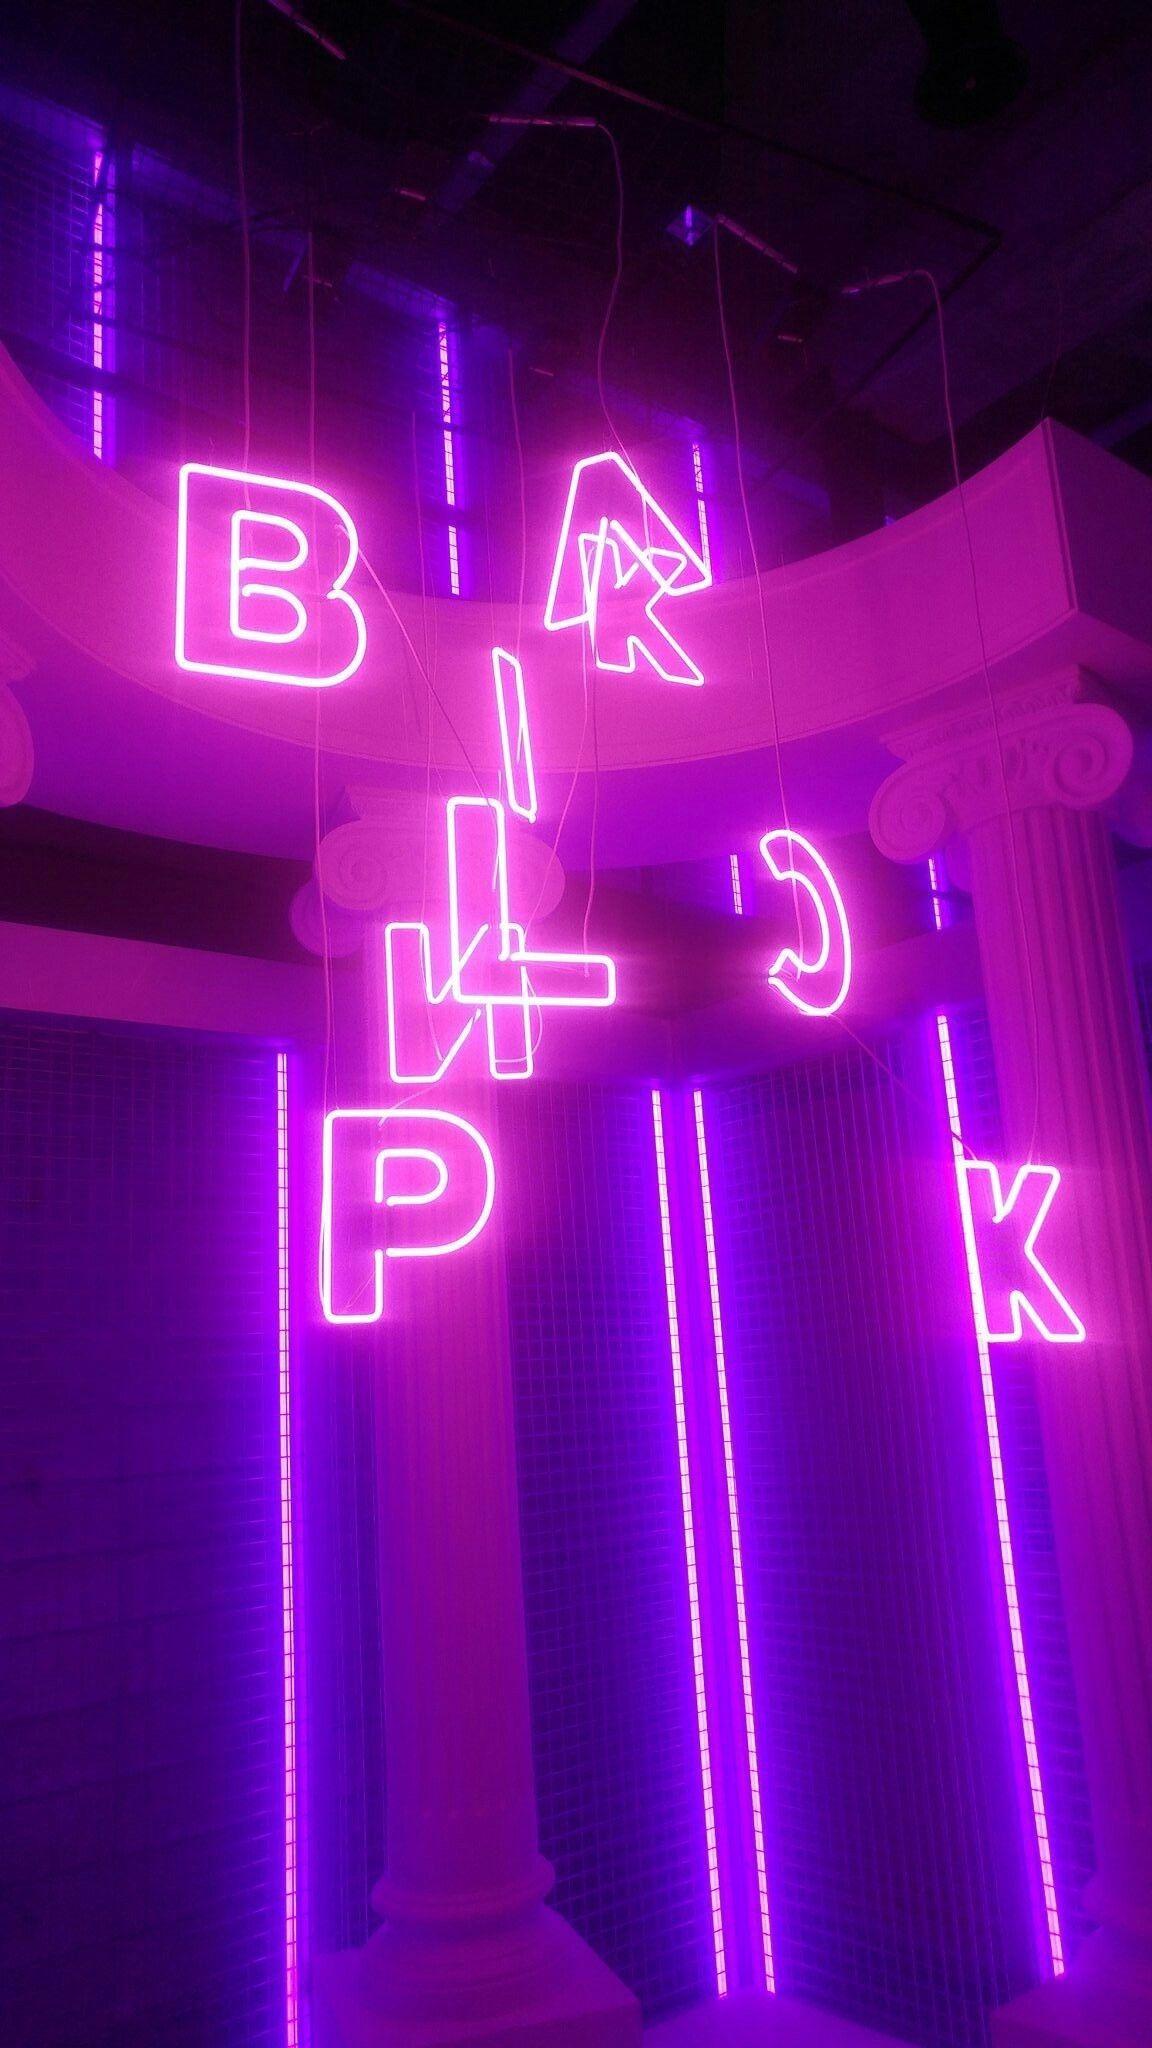 BlackPink Sfondi iphone, Sfondi viola, Fotografia sfondi